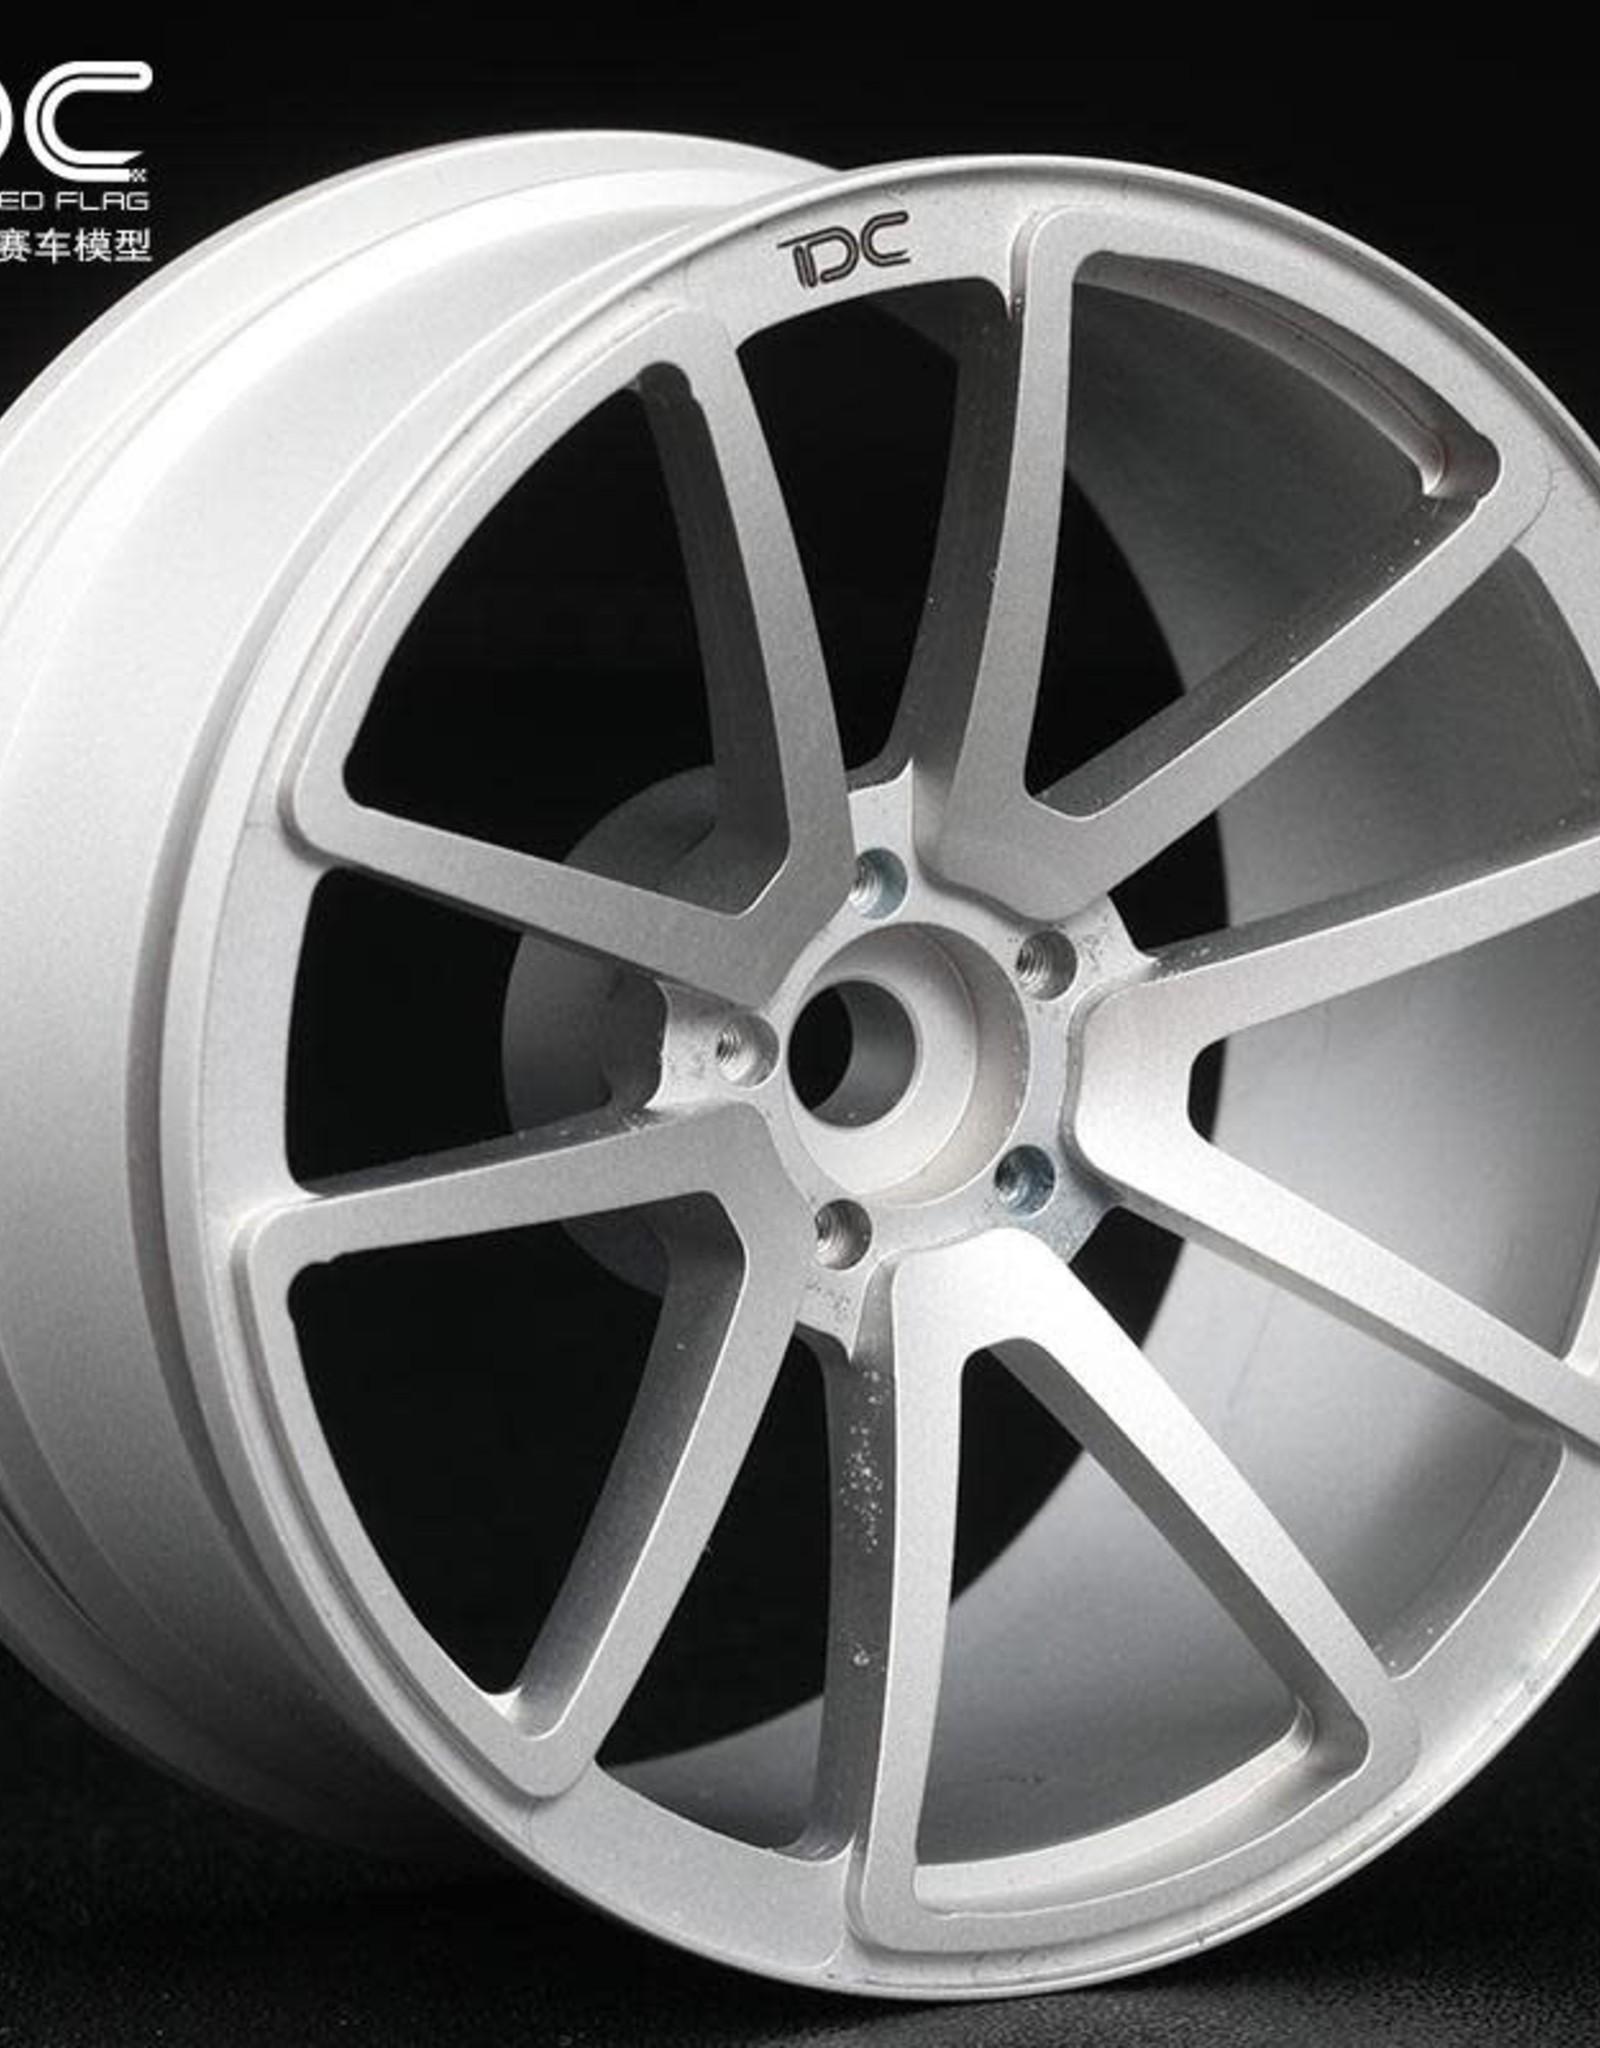 Team DC DC-50445 DC-50445 Aluminum CNC Drift Wheel SPF 6mm Offset Black (4) by Team DC